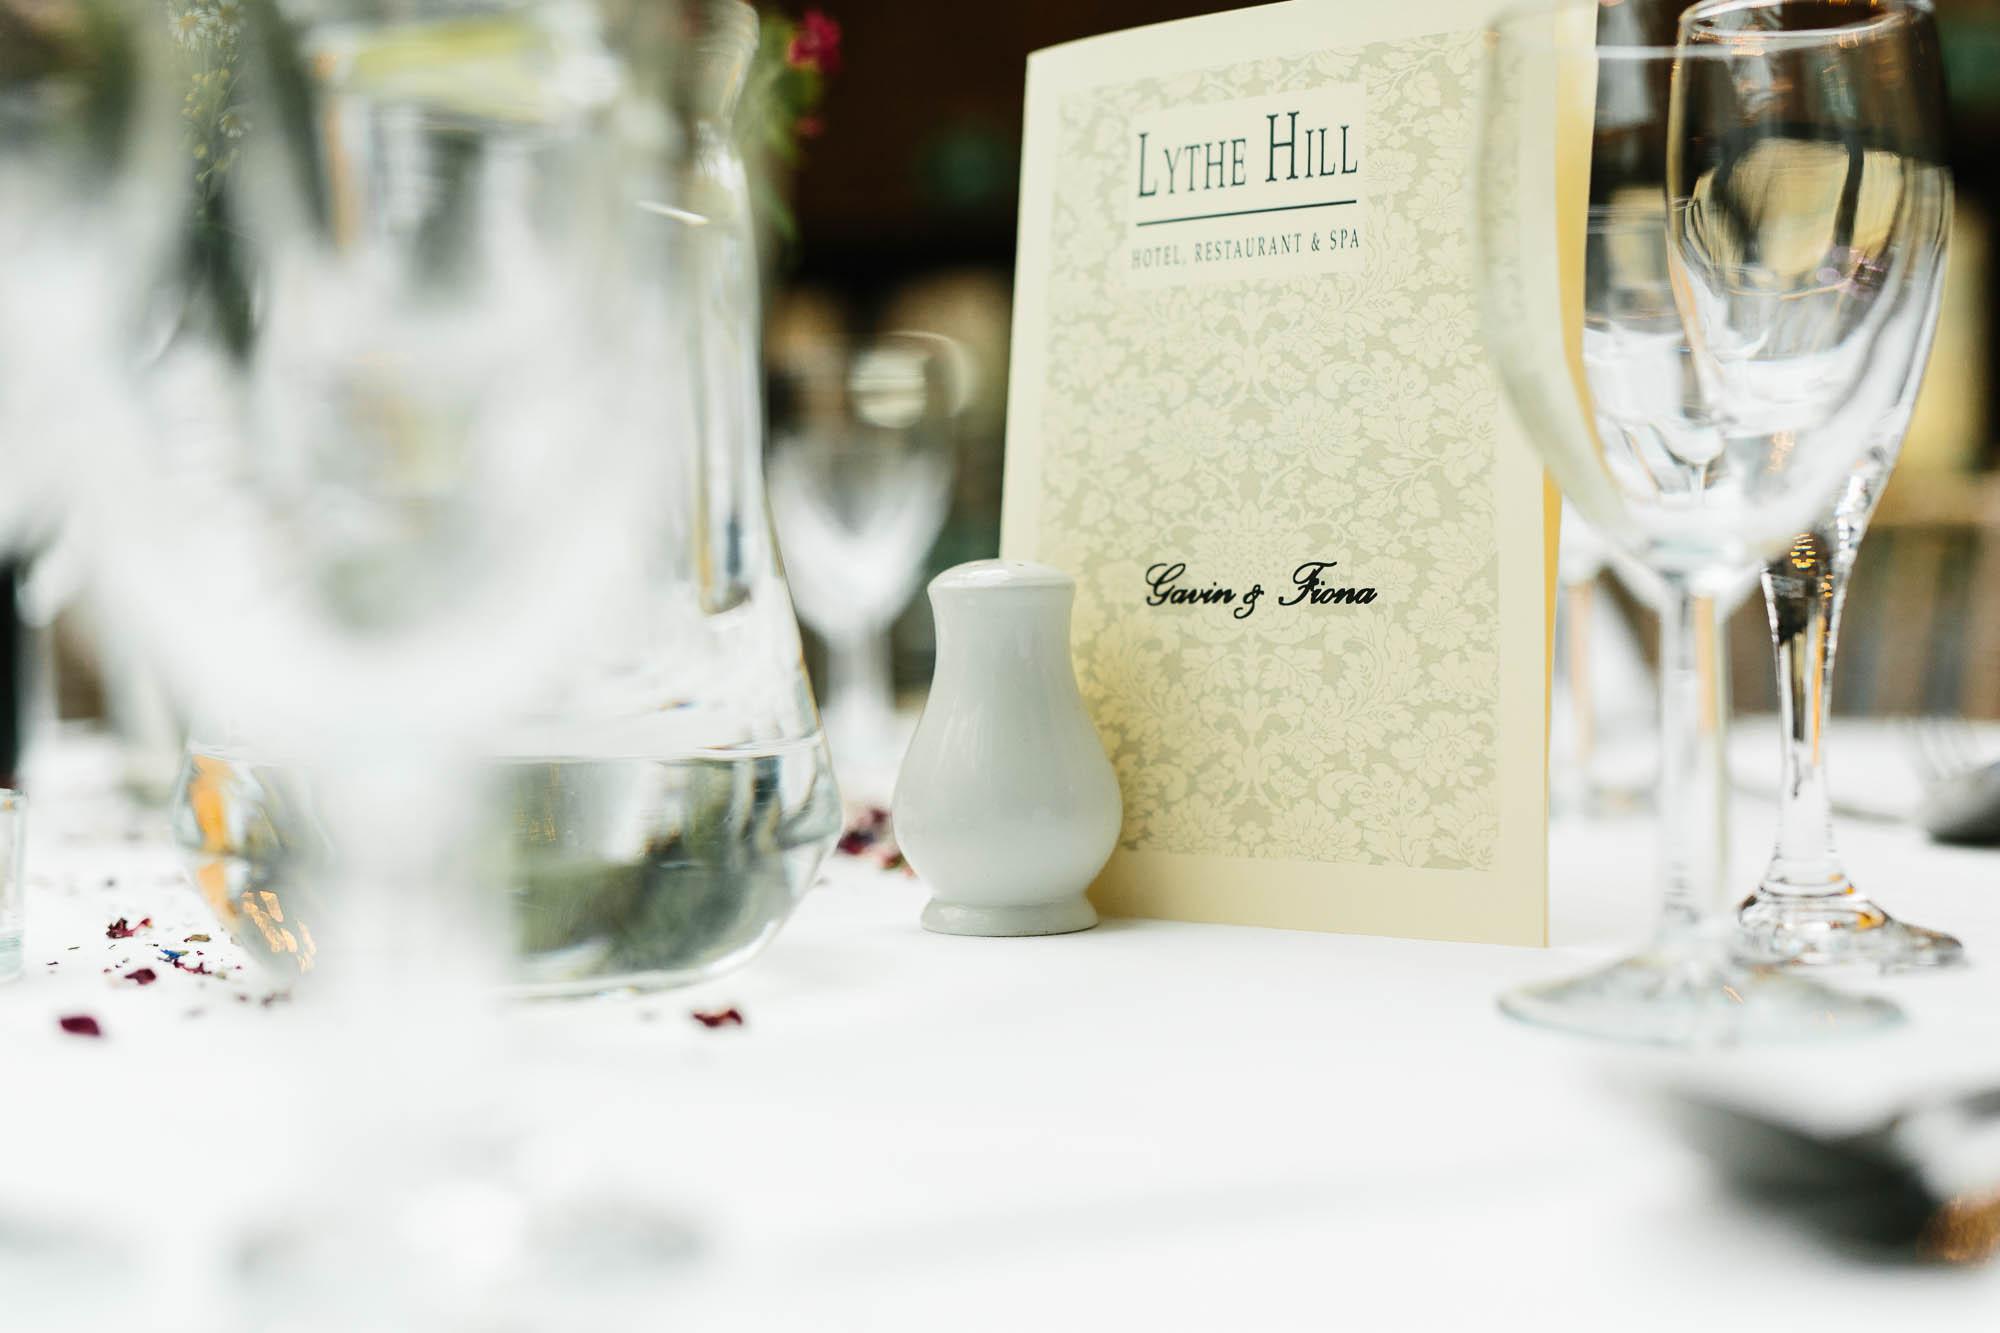 Lythe Hill Hotel Wedding Photography - Gavin and Fiona 4